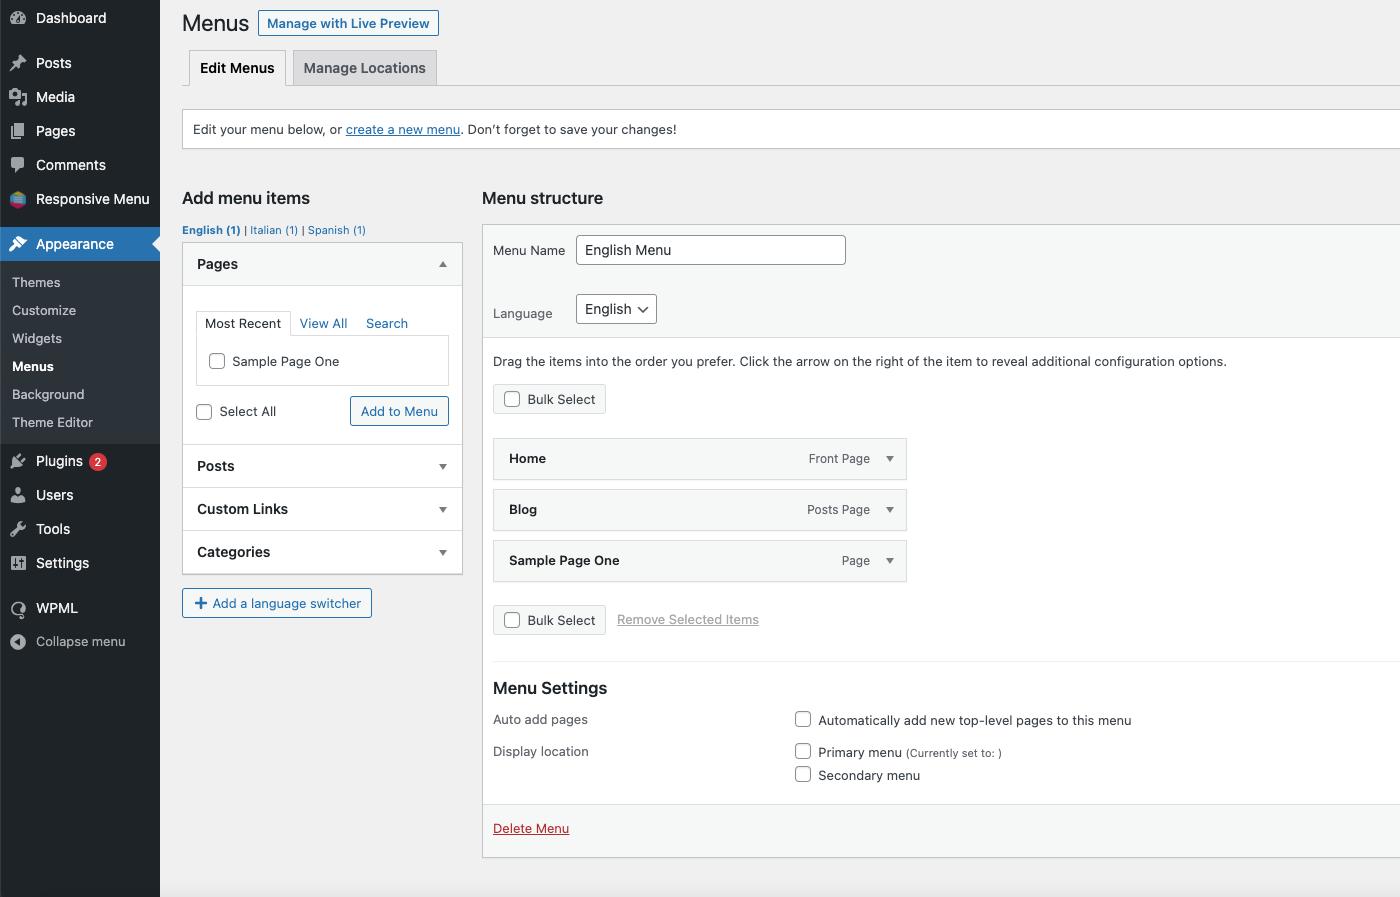 Integrate Responsive Menu with WPML - Creating English Menu